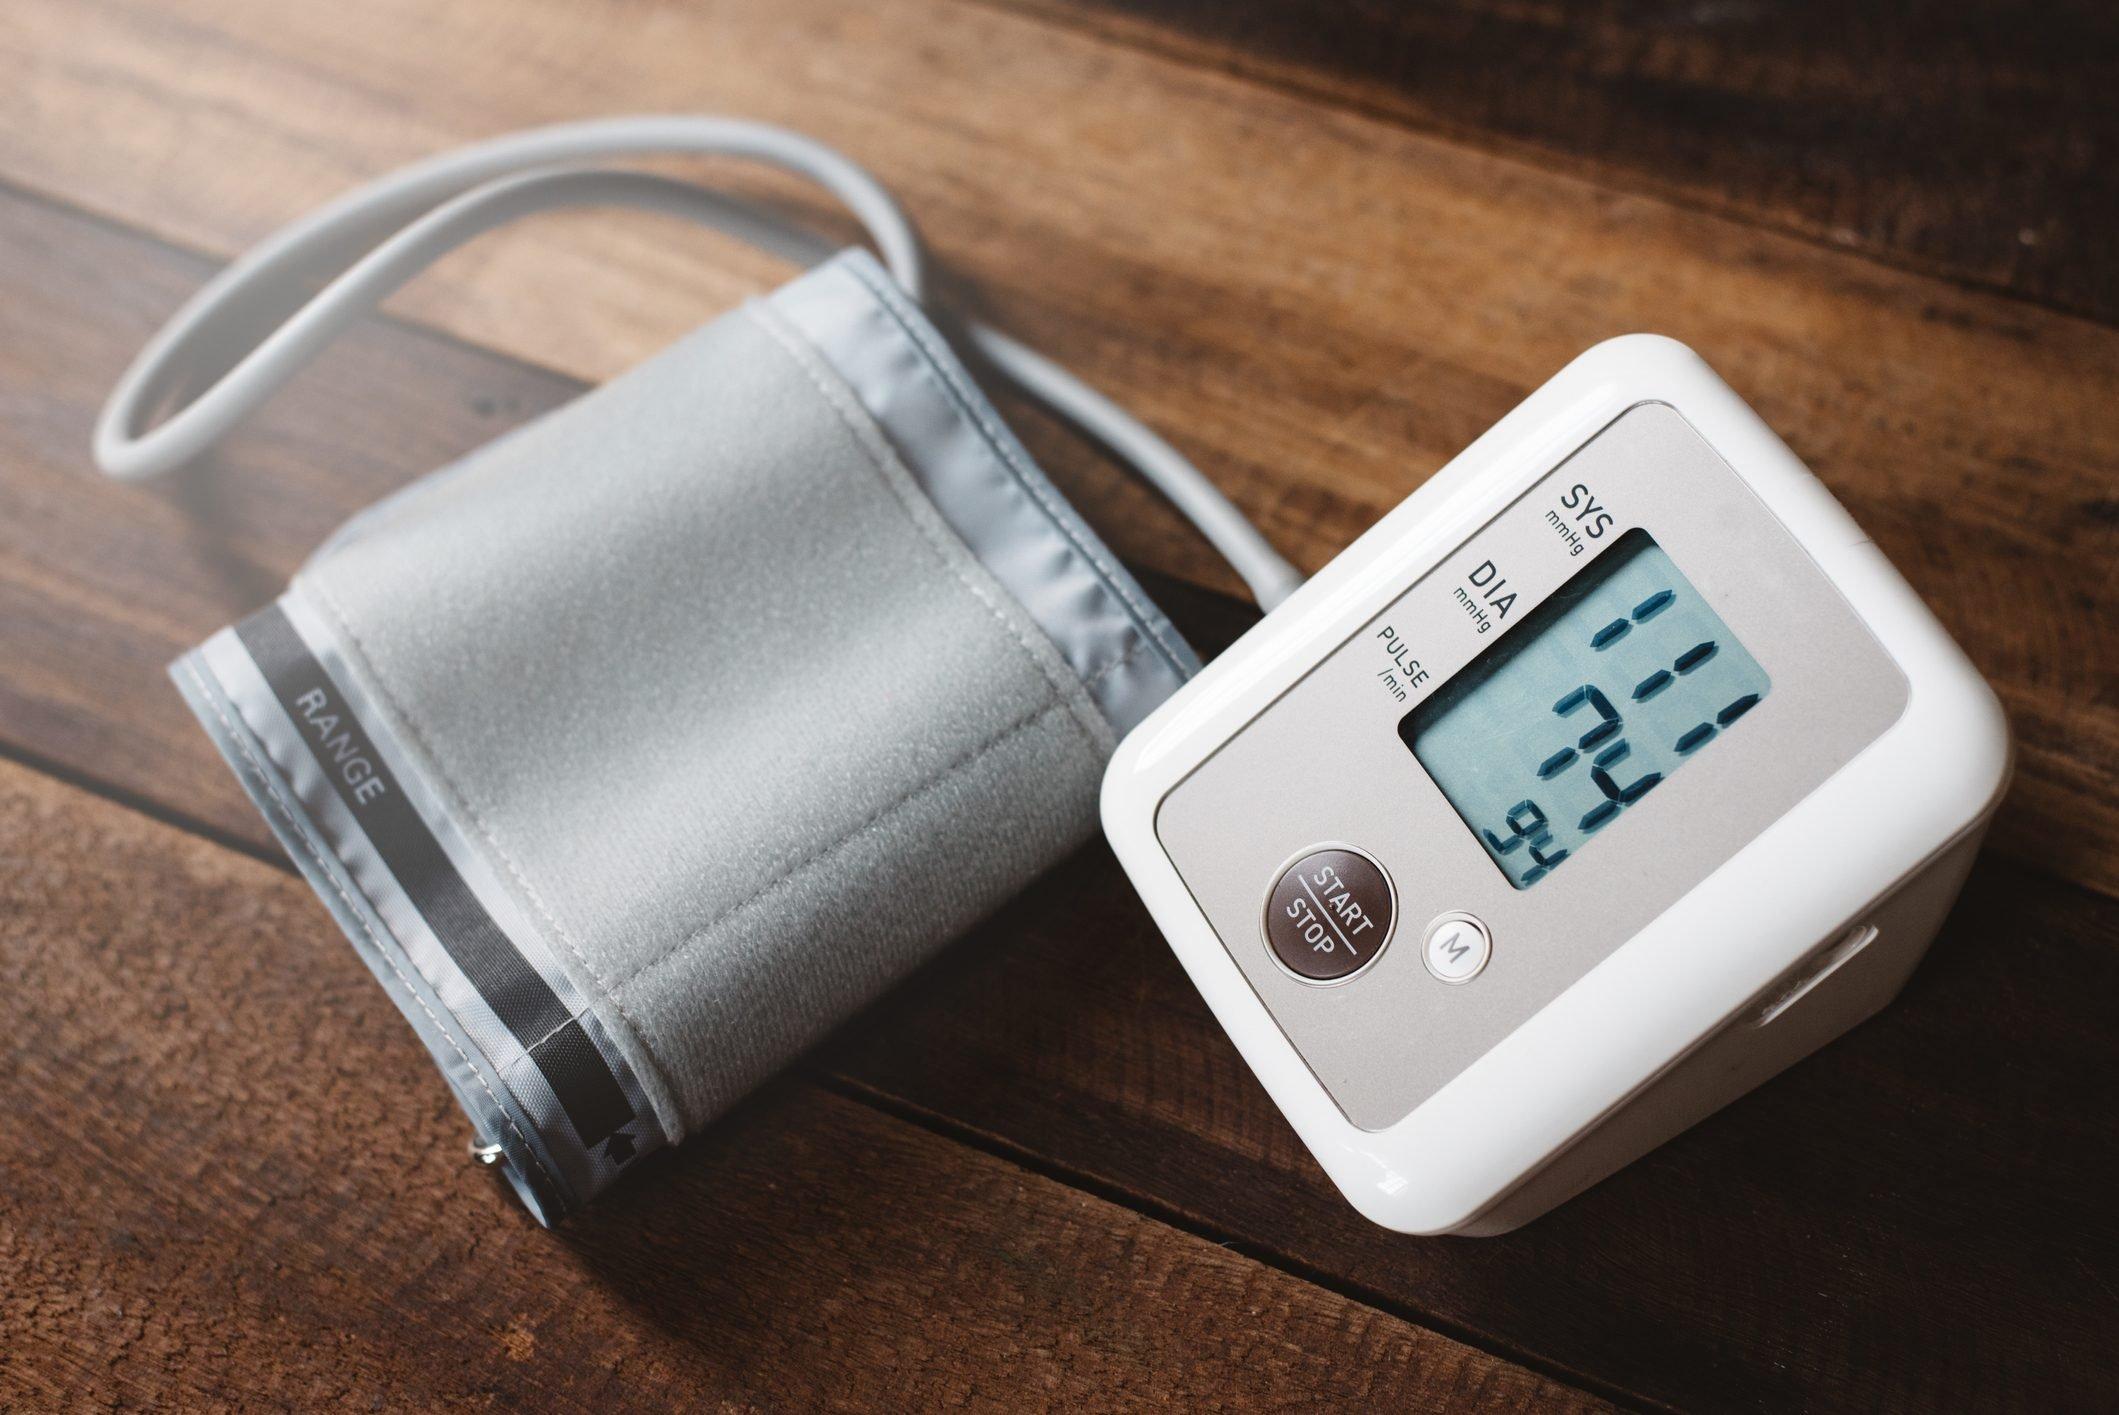 blood pressure machine on wood table